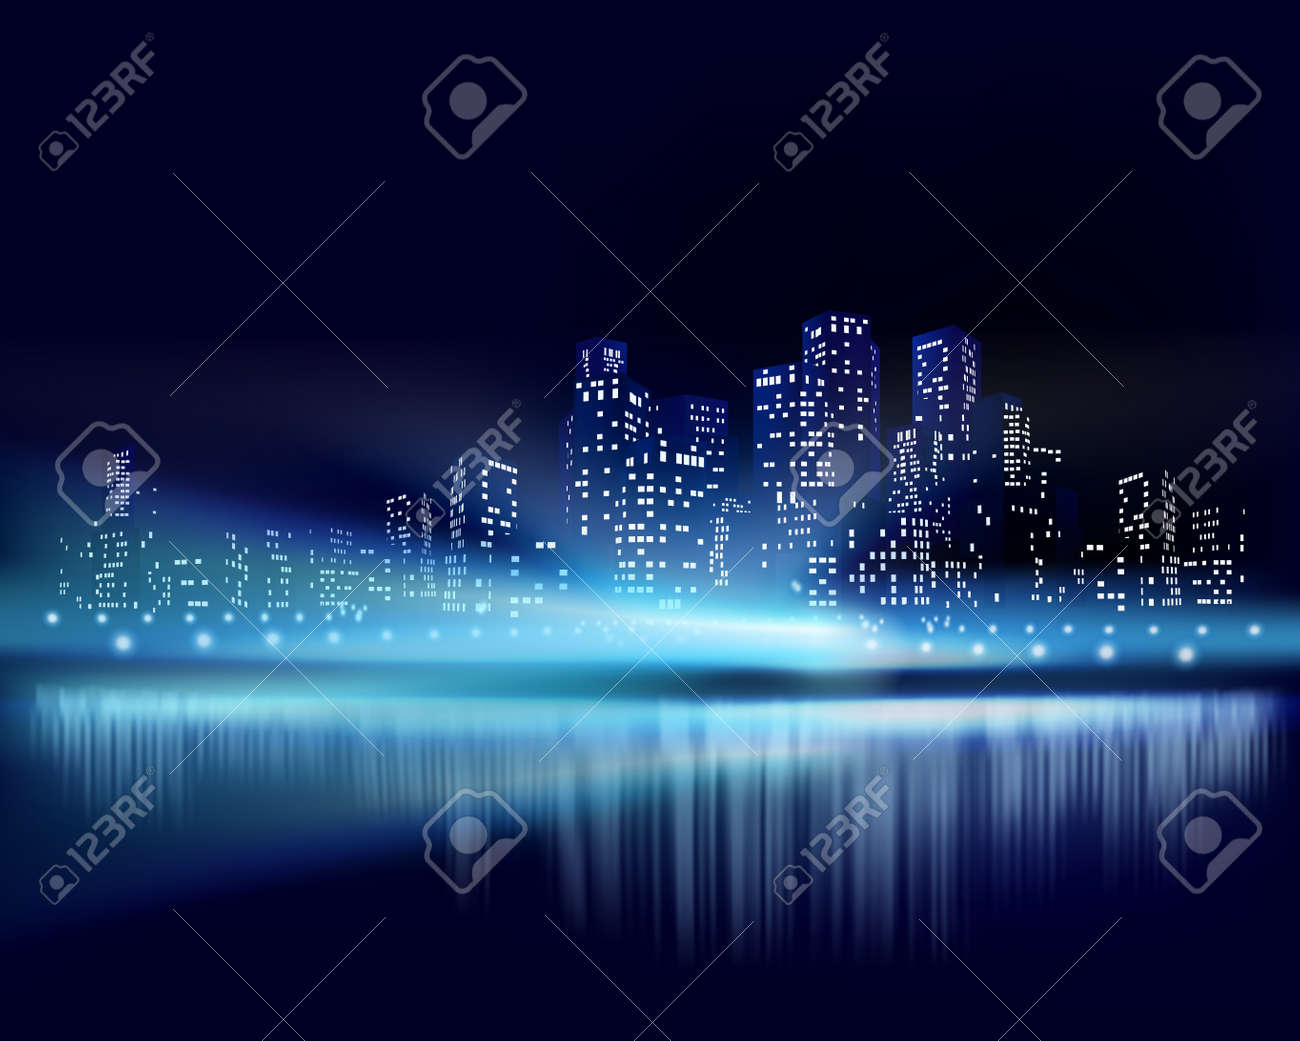 City view at night. Vector illustration - 47703846